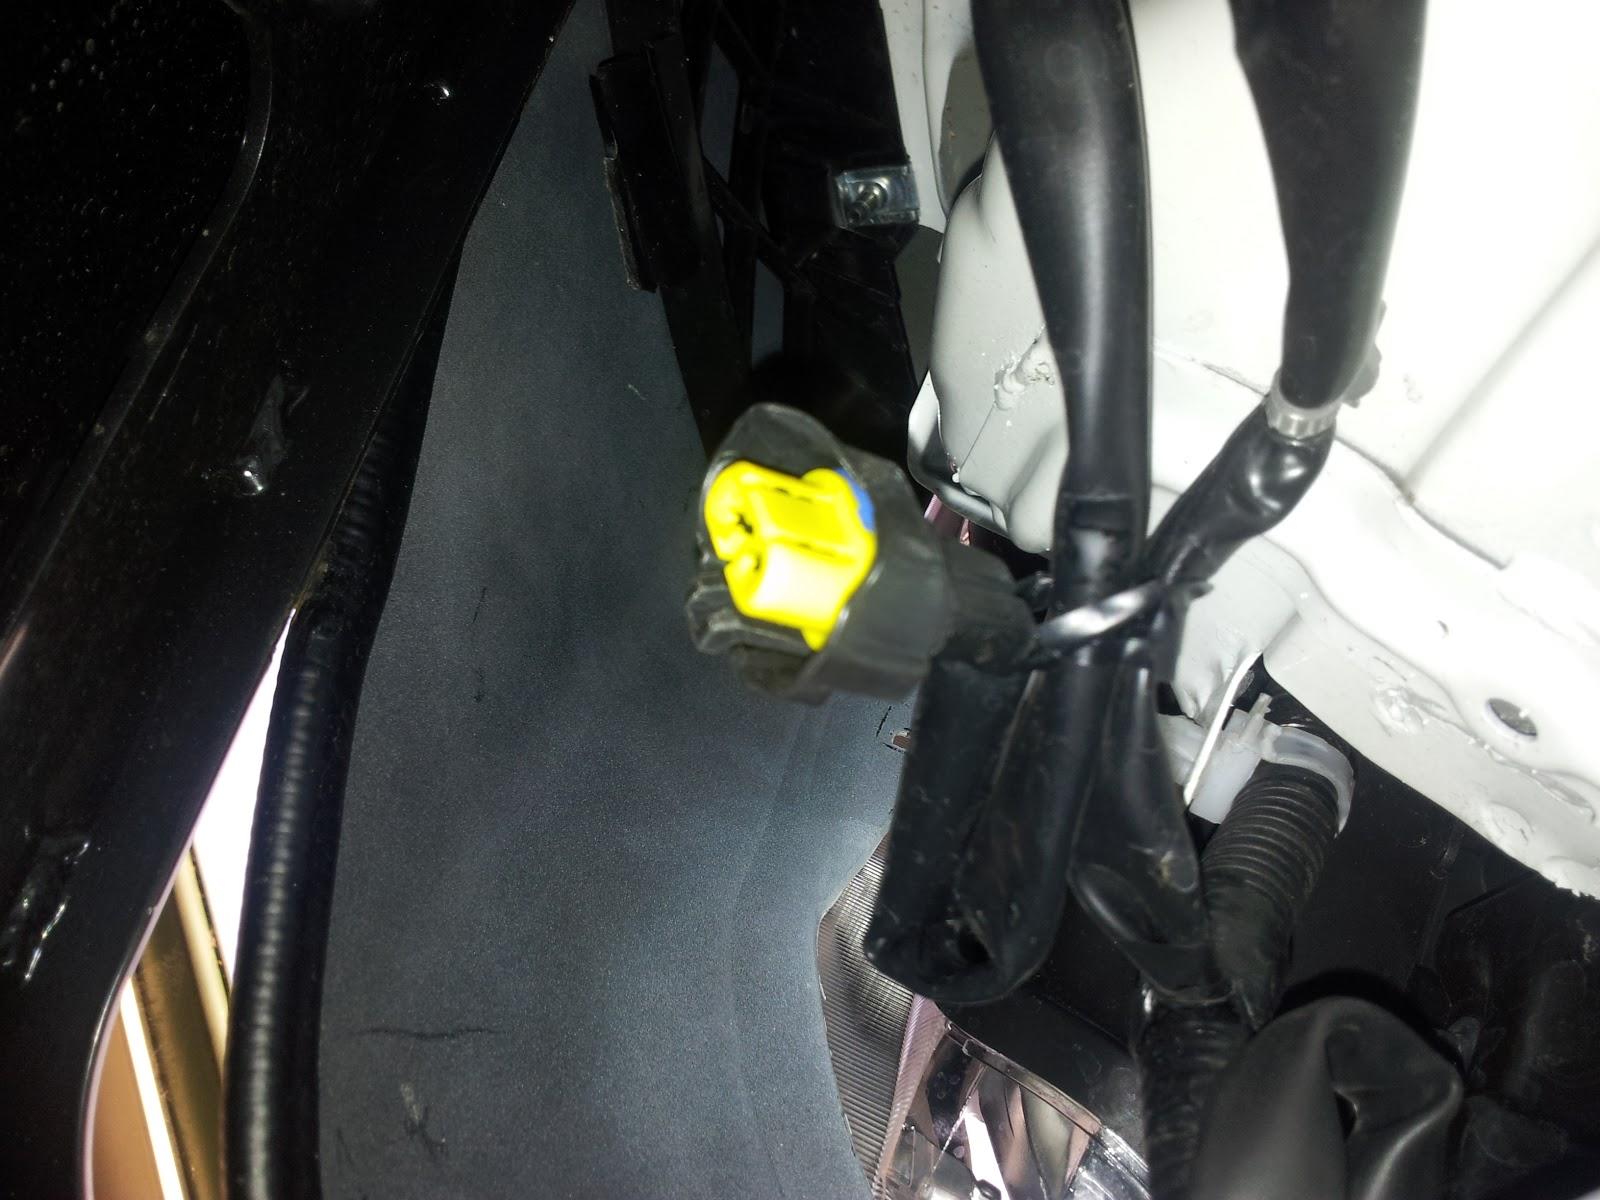 Nissan Navara D40 Trailer Plug Wiring Diagram Side View Of Skull In Arb Bullbar Lights Indicators The Forum